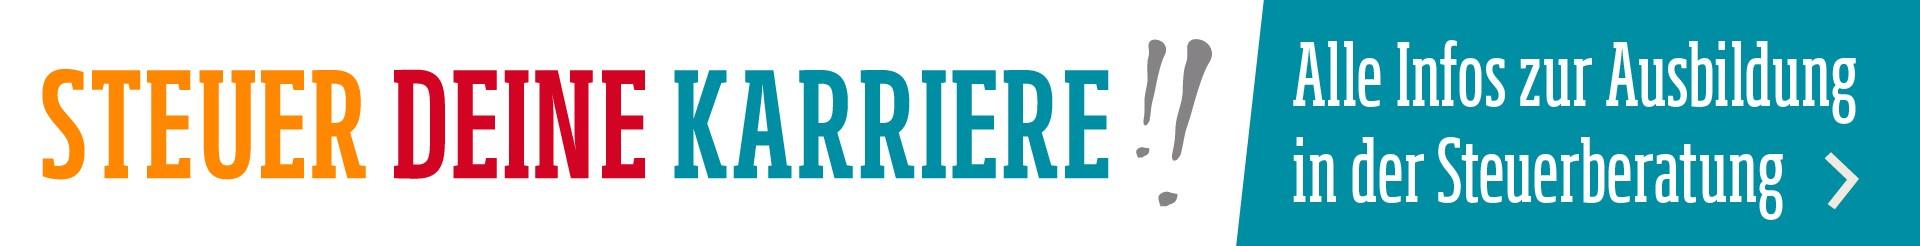 www.SteuerDeineKarriere.de